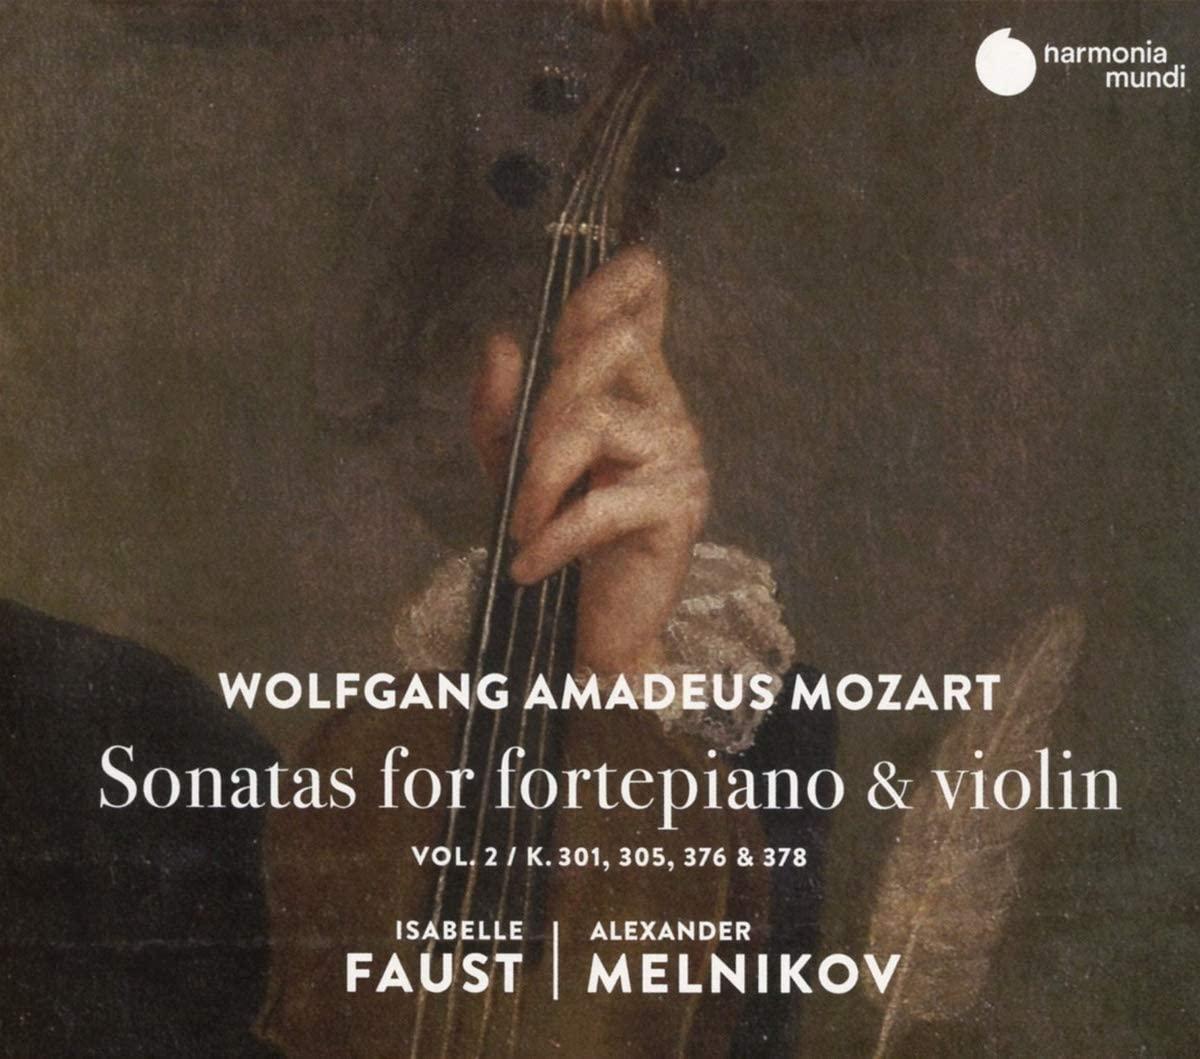 Wolfgang Amadeus Mozart: Sonatas For Fortepiano & Violin